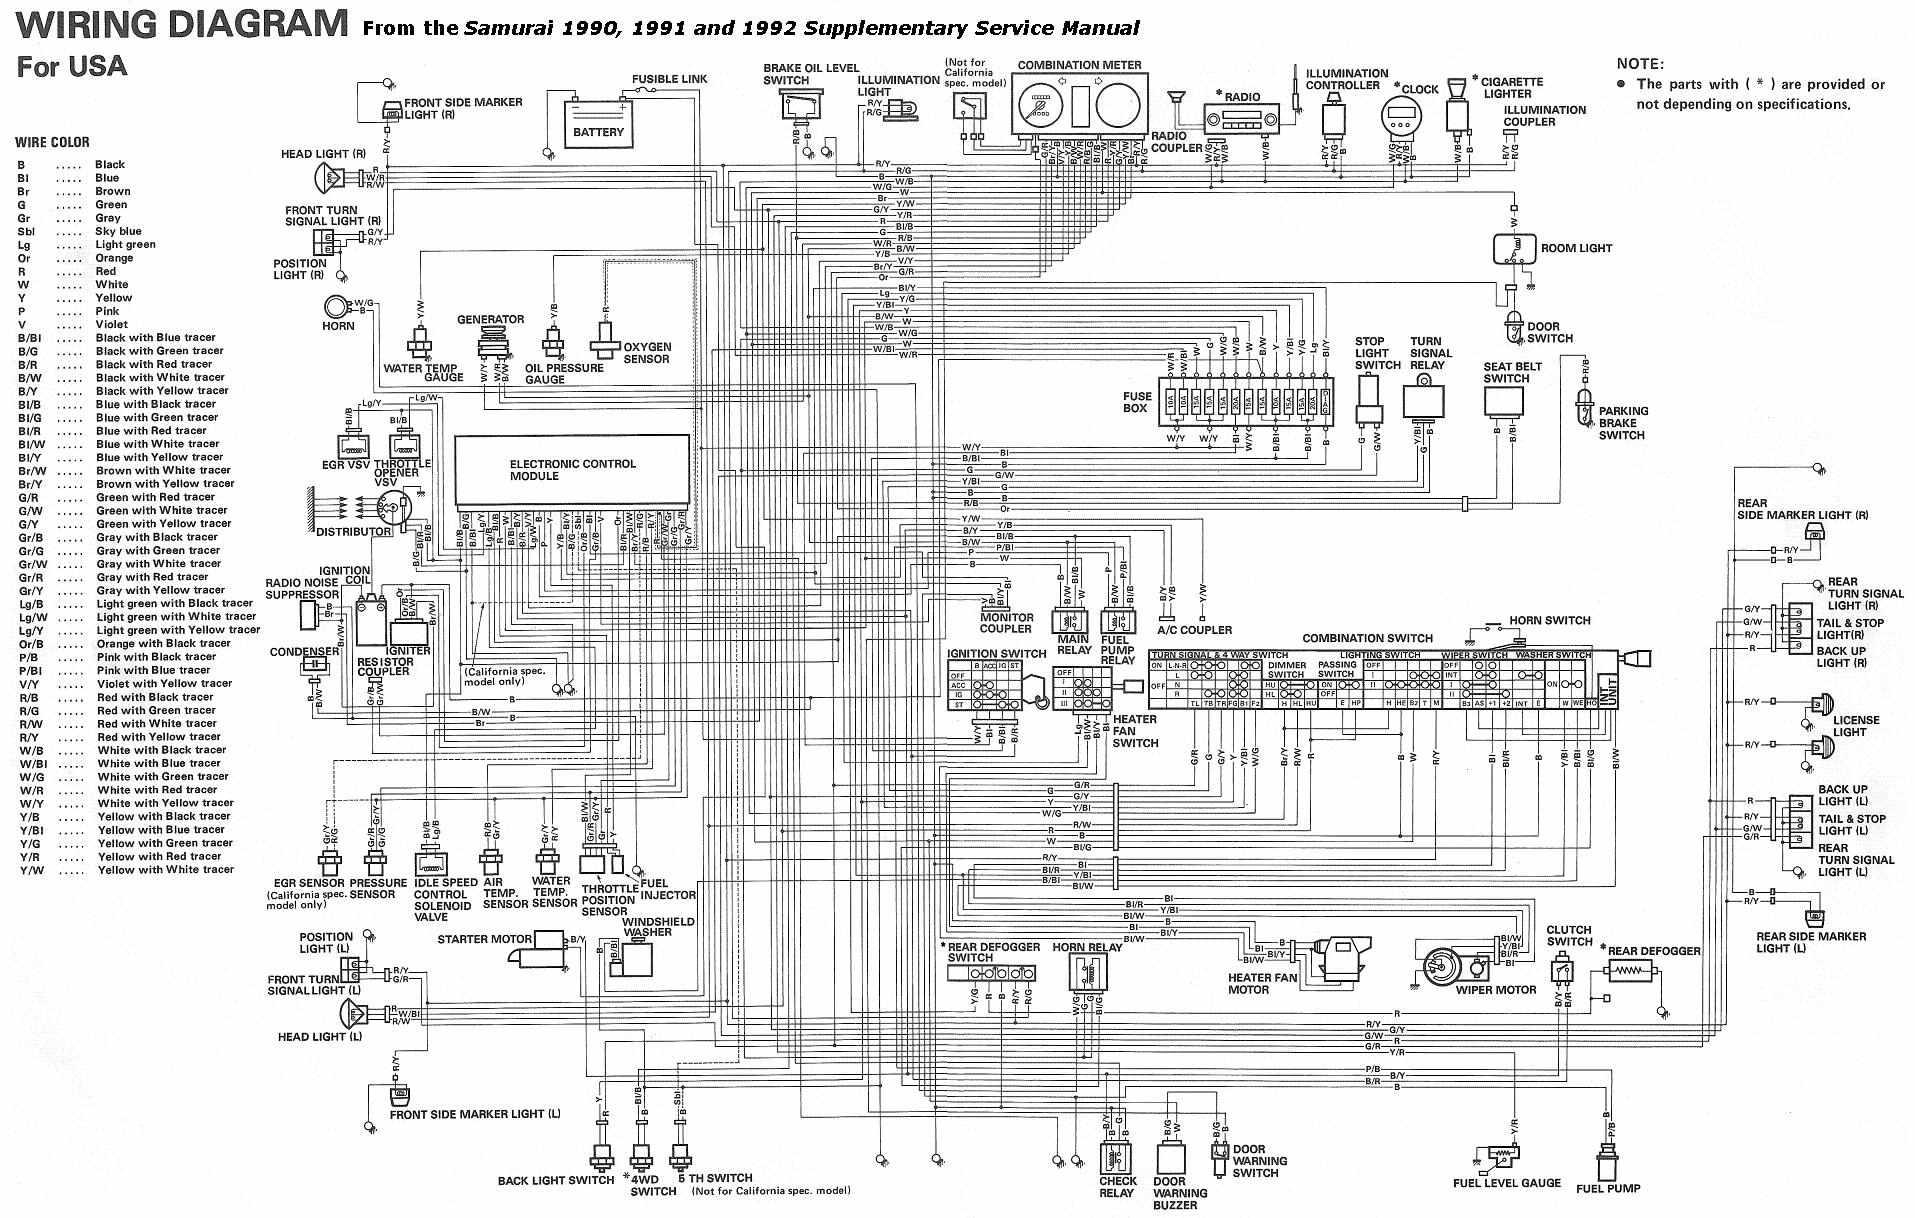 Suzuki wiring diagram pdf suzuki car manuals wiring diagrams pdf fault codes asfbconference2016 Image collections